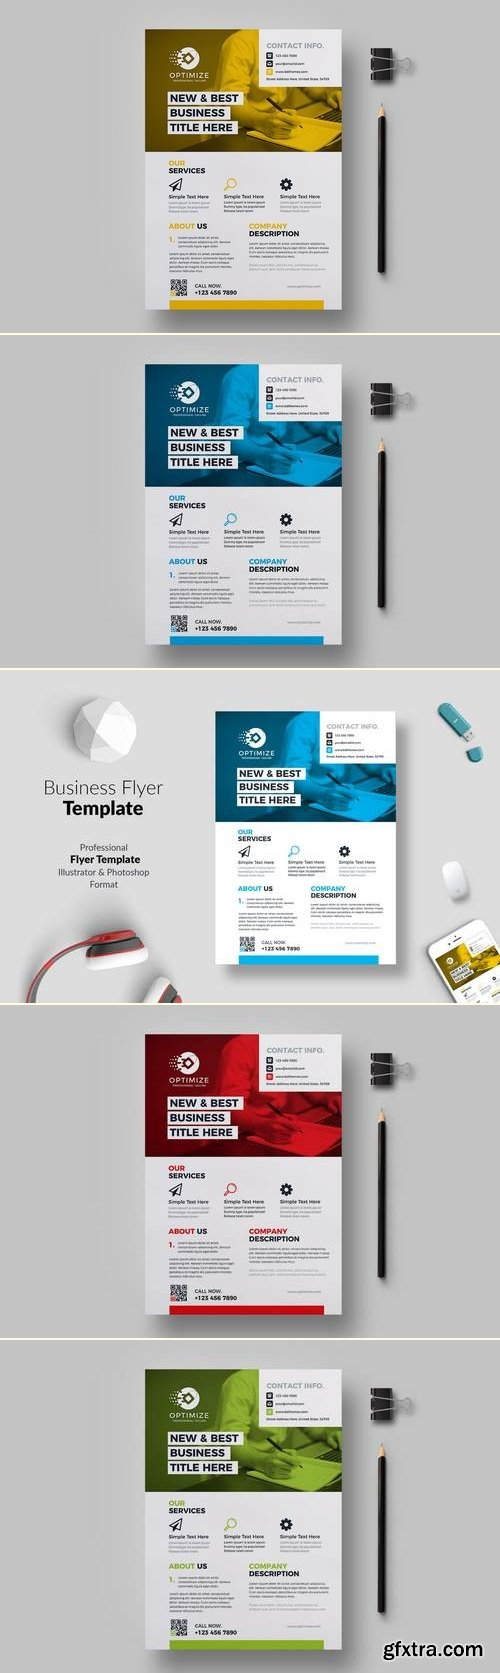 Business Flyer Template 05